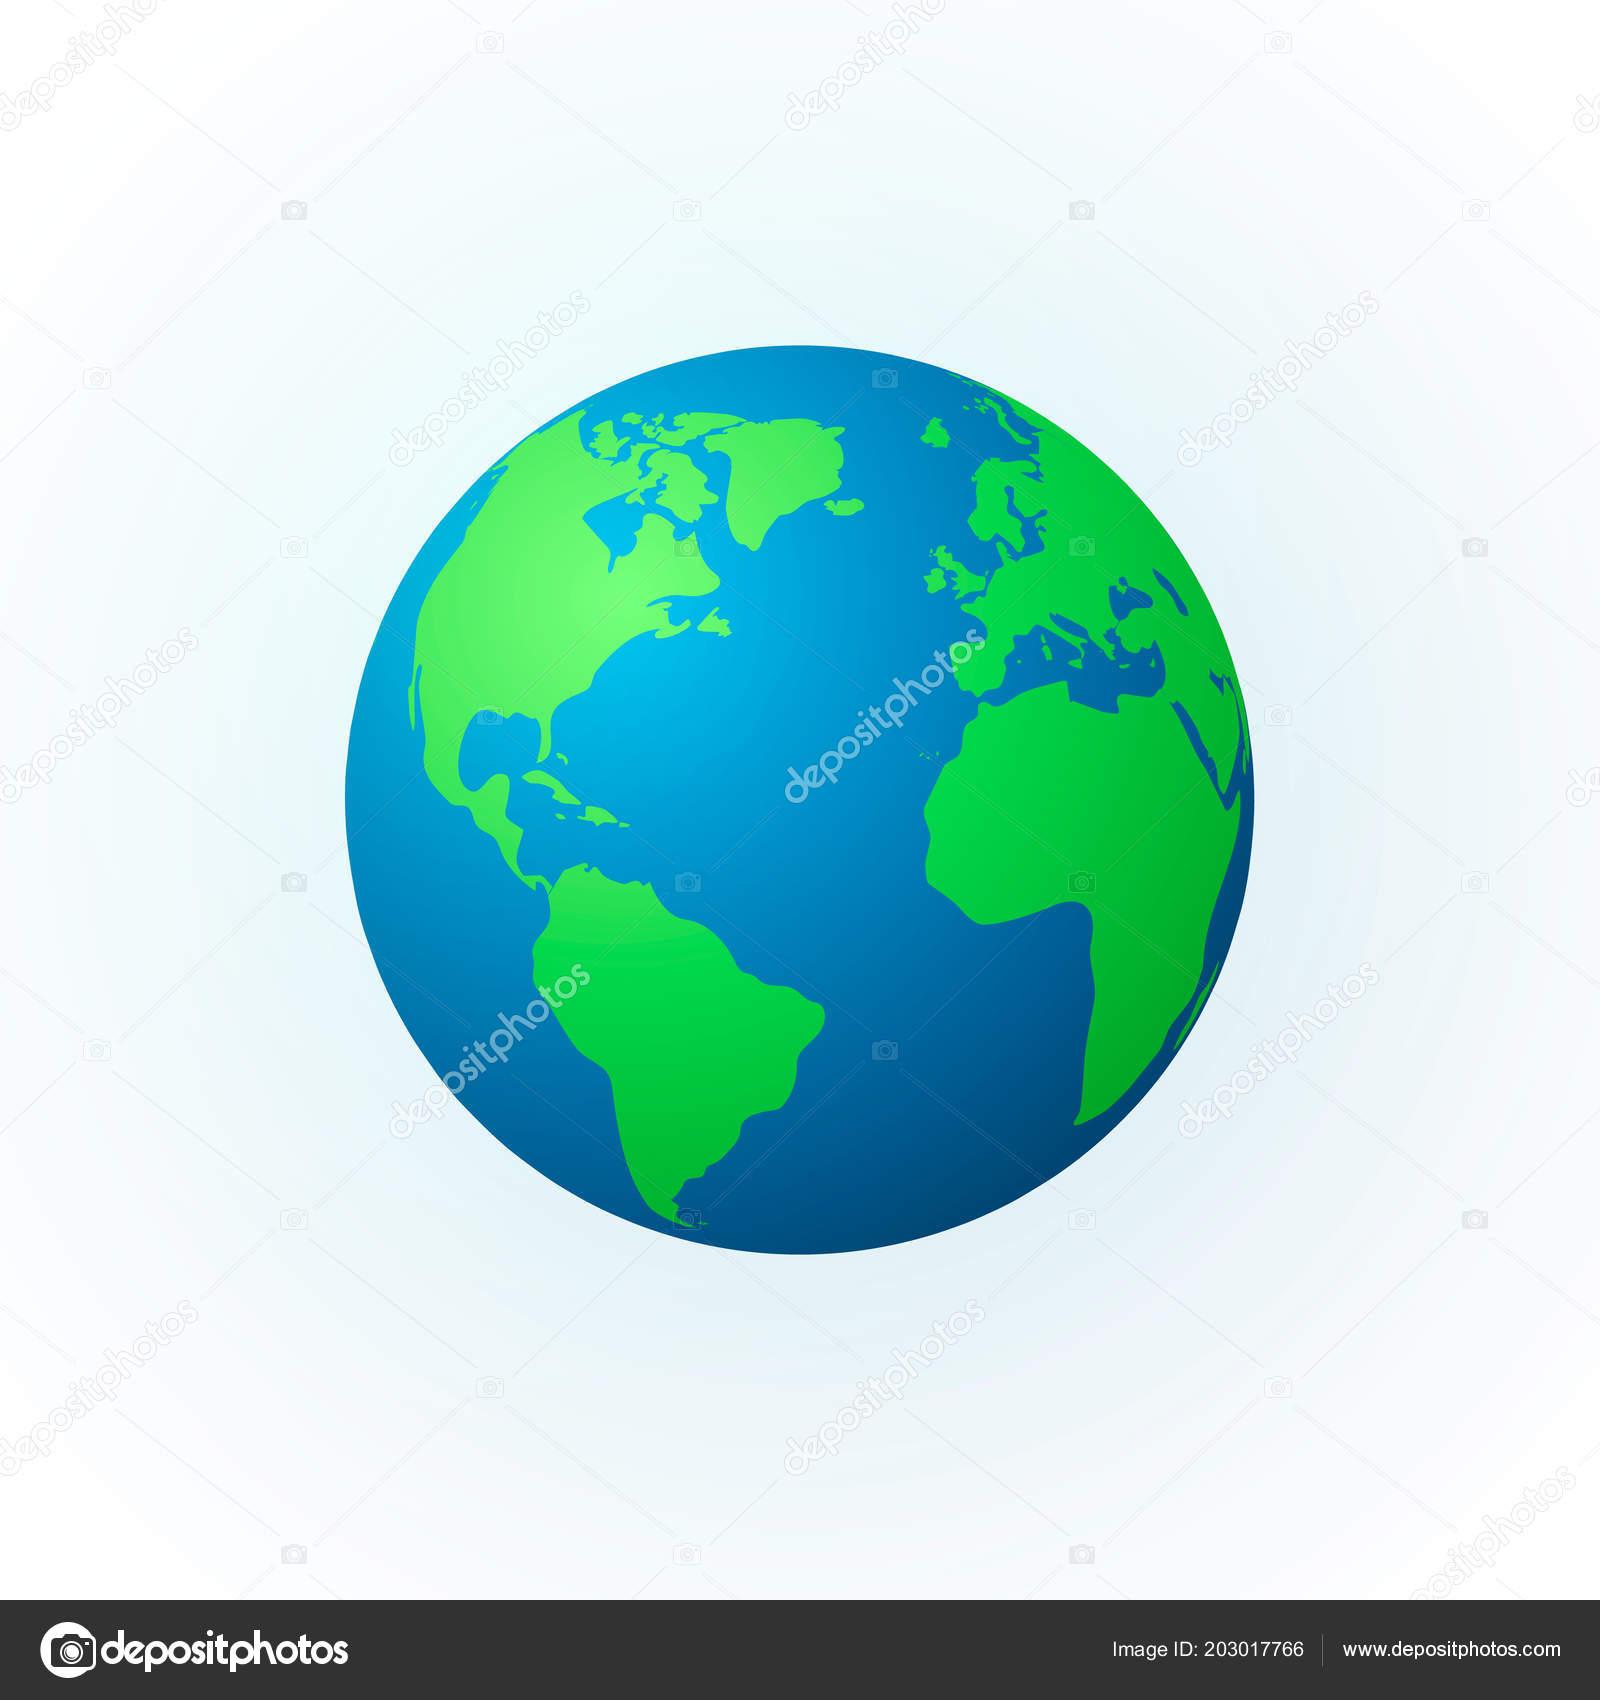 Earth Form Globe Earth Planet Icon Detailed Colored World ... on coordinates of earth, earthquake earth, encyclopedia of earth, death of earth, inhabitants of earth, gps of earth, united states of earth, camera of earth, city of earth, existence of earth, google of earth, information of earth, sun of earth, project of earth, detailed aruba map, photographs of earth,